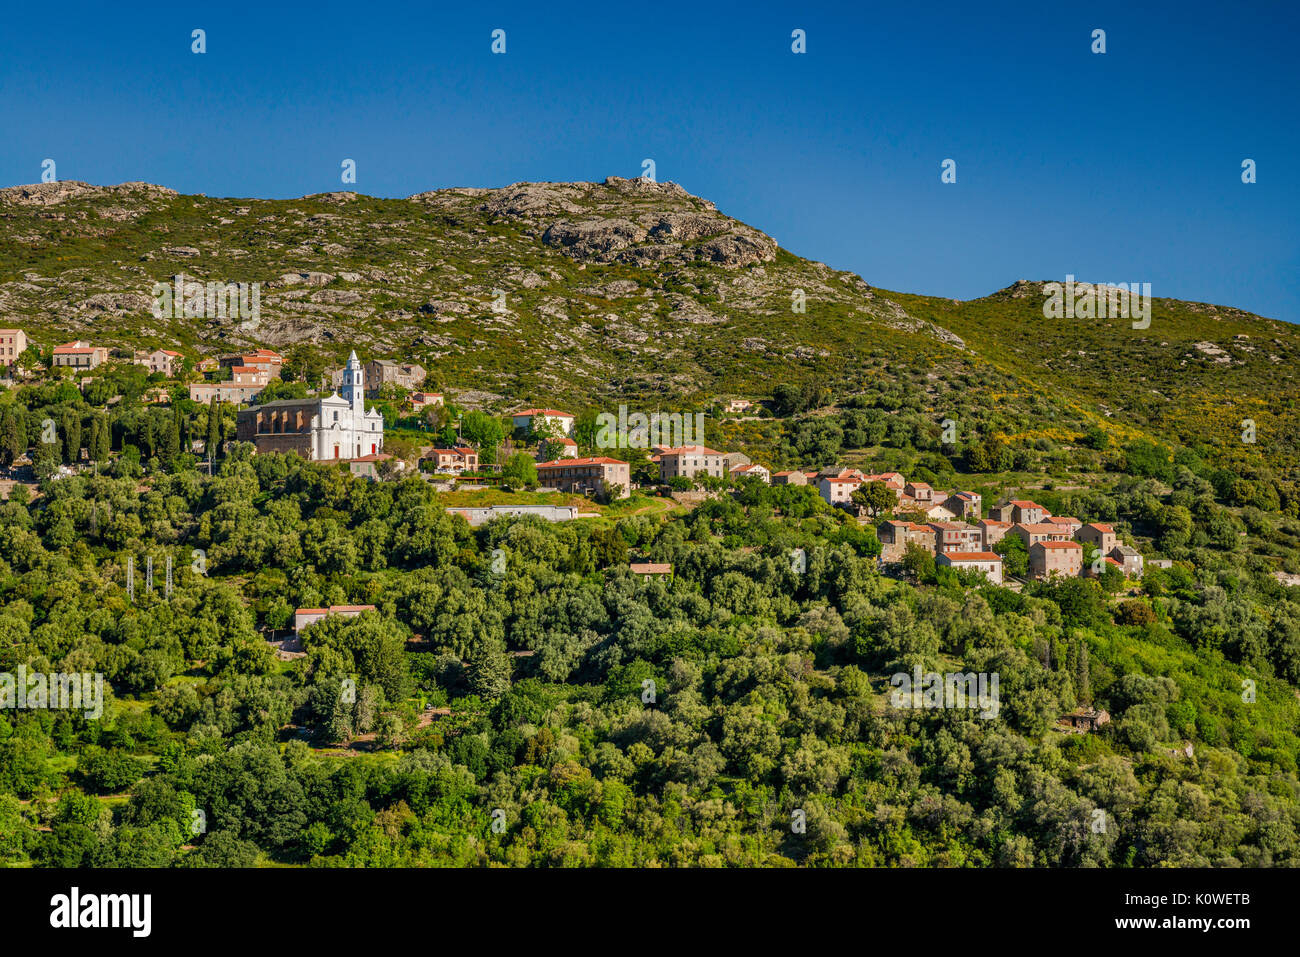 Stadt Santo-Pietro-di-Tenda, Nebbio Region, Departement Haute-Corse, Korsika, Frankreich Stockbild